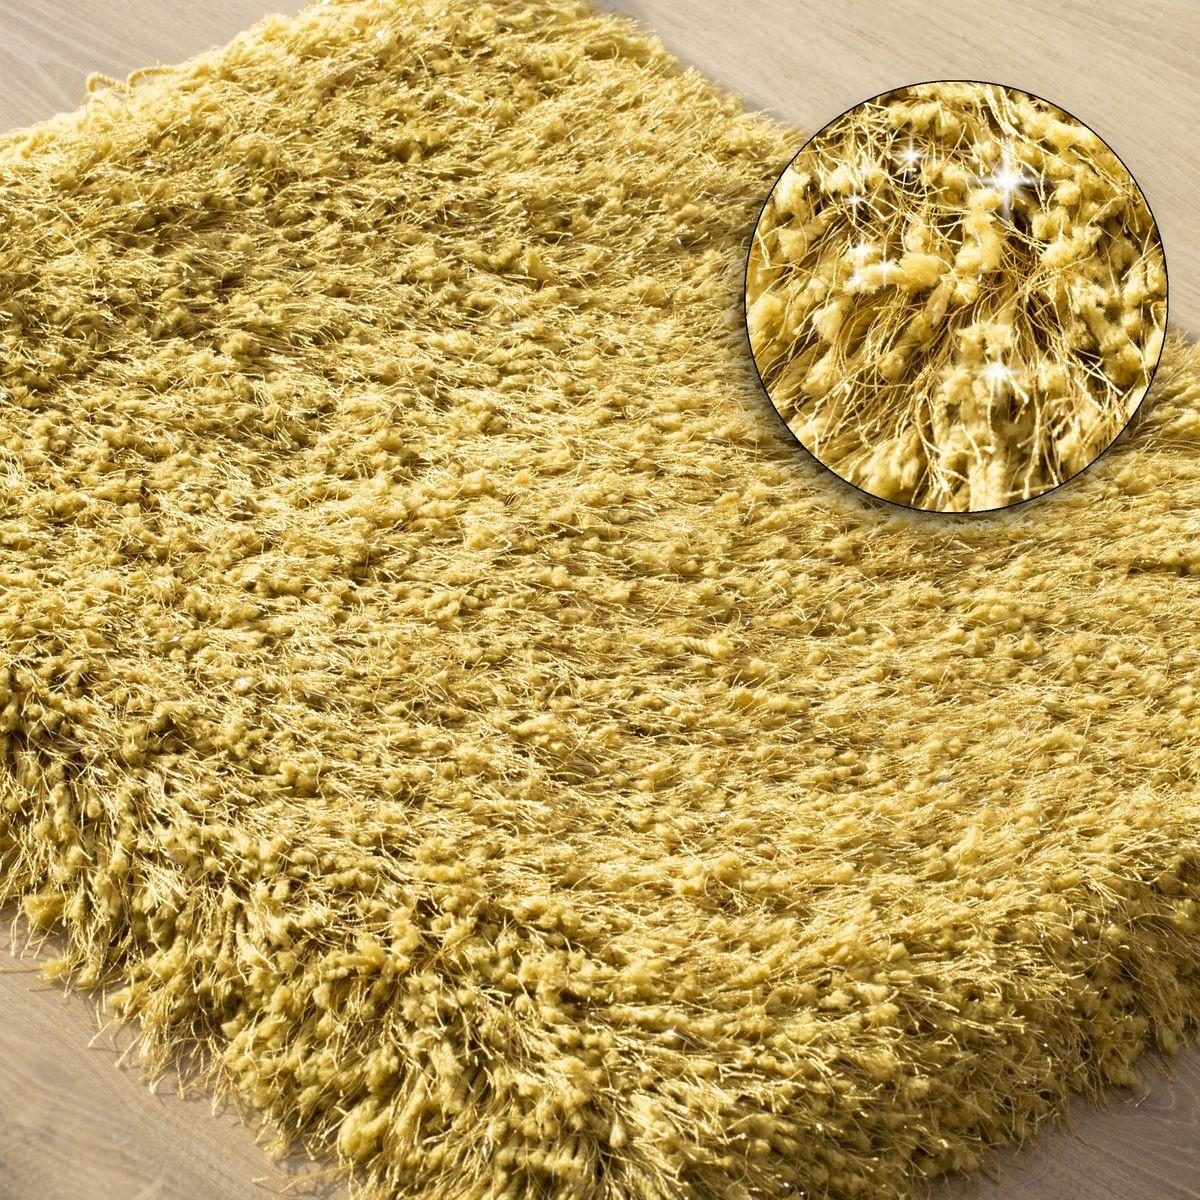 DomTextilu Žltý huňatý koberec do kúpelne Šírka: 50 cm   Dĺžka: 70 cm 44472-208053